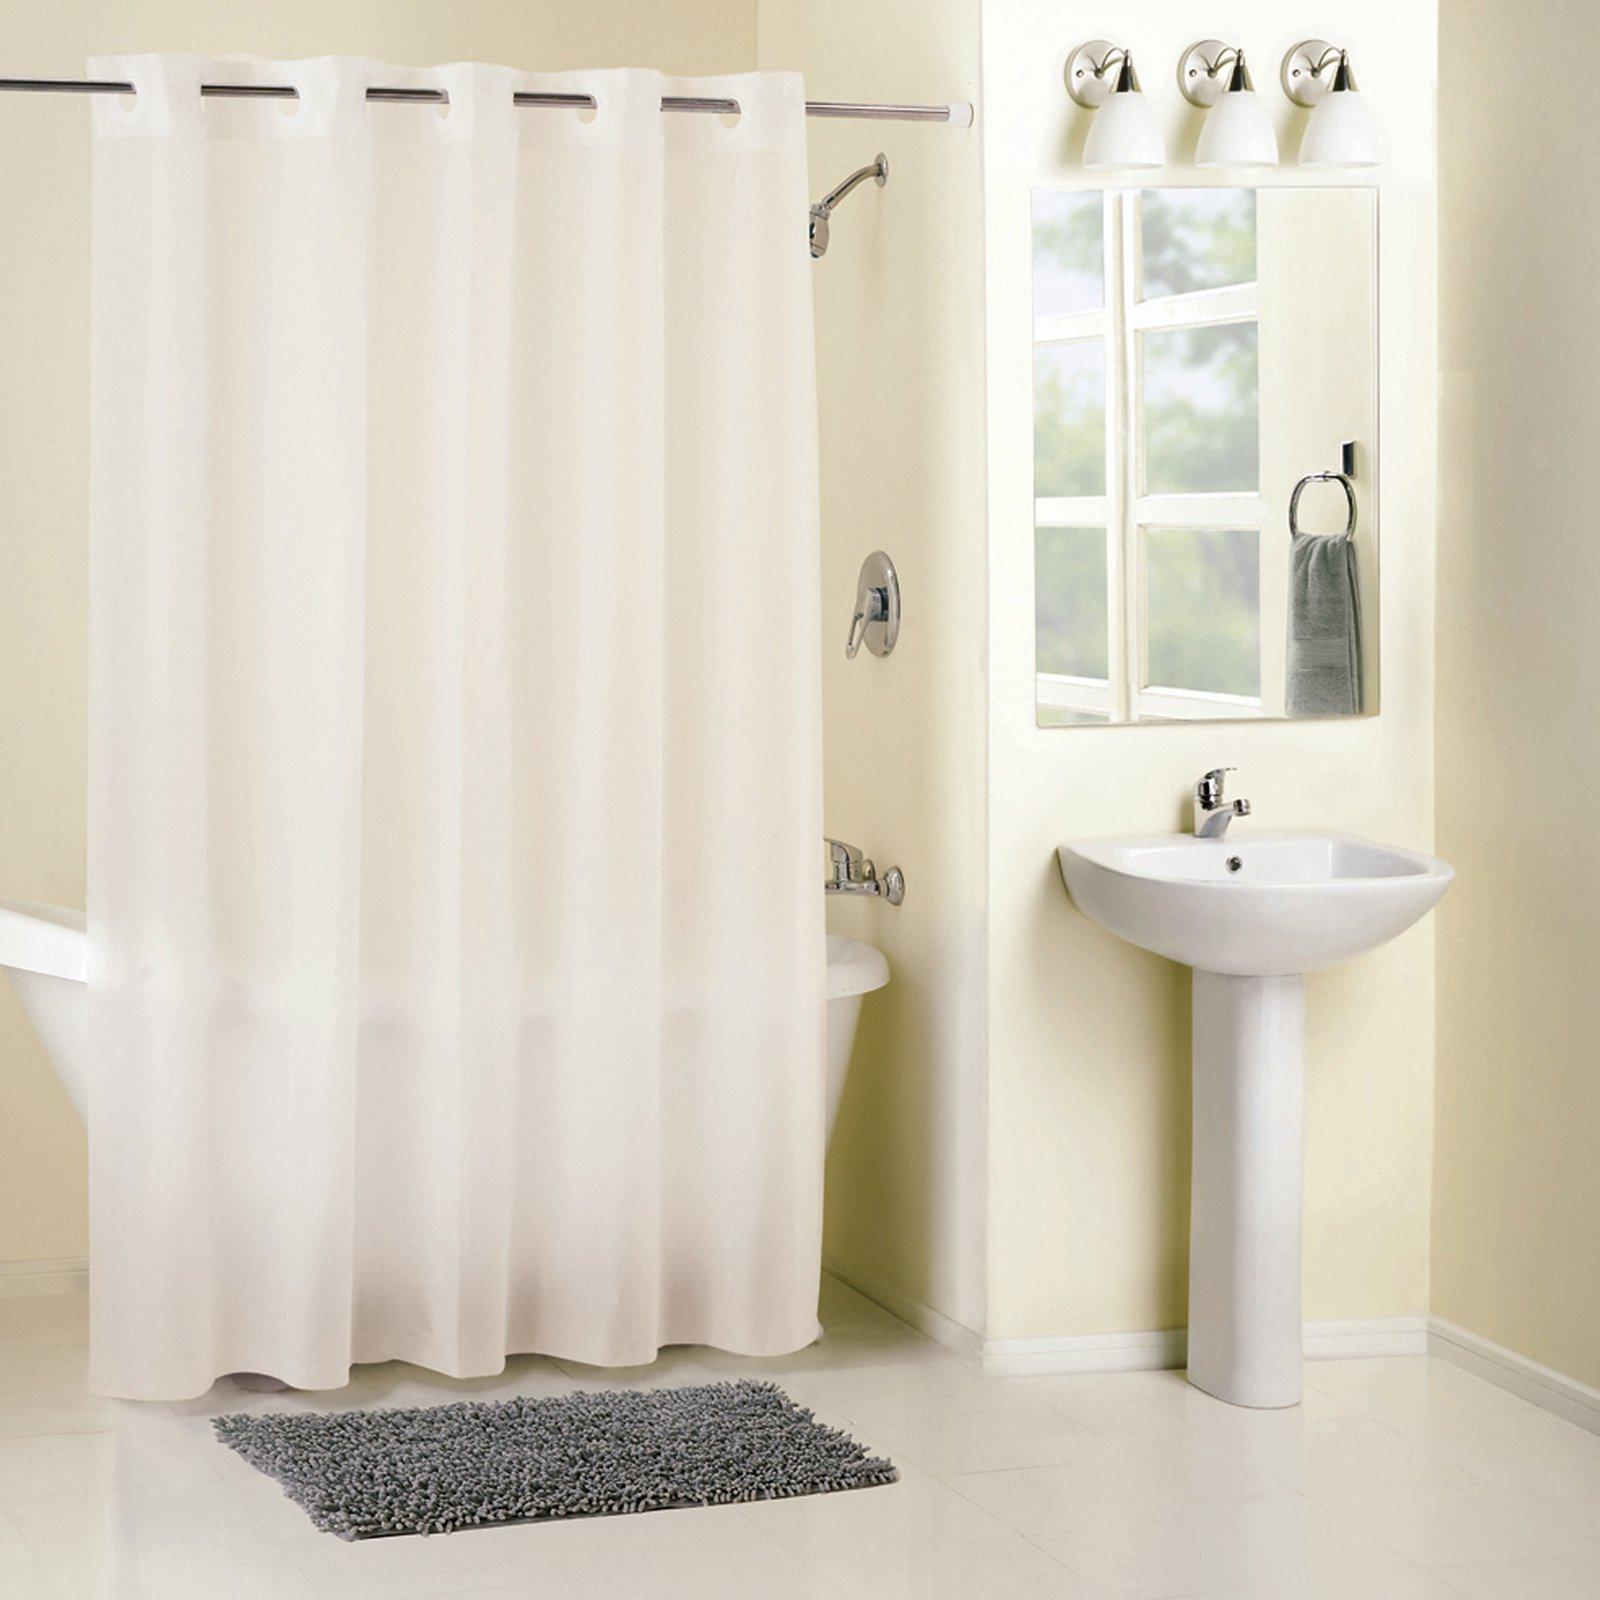 kohls hookless shower curtains   bath-supplies.store